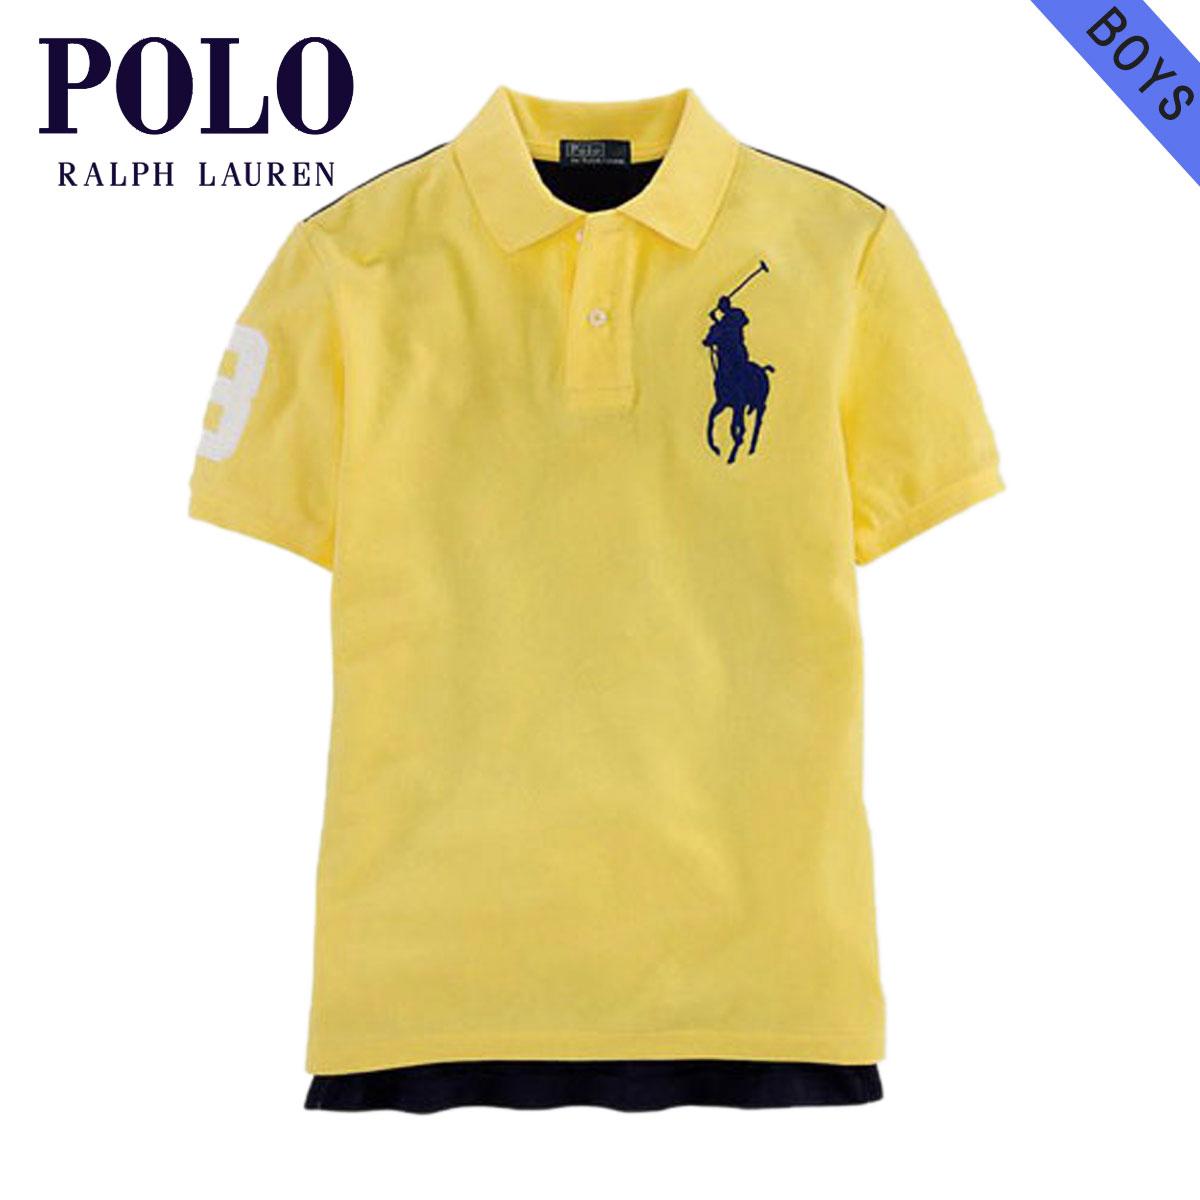 ebe67940d65e9 Poloralflorenkids POLO RALPH LAUREN CHILDREN genuine kids clothing boys Polo  Shirt Big Pony Mesh Polo  18121236 YELLOW 10P22Jul14